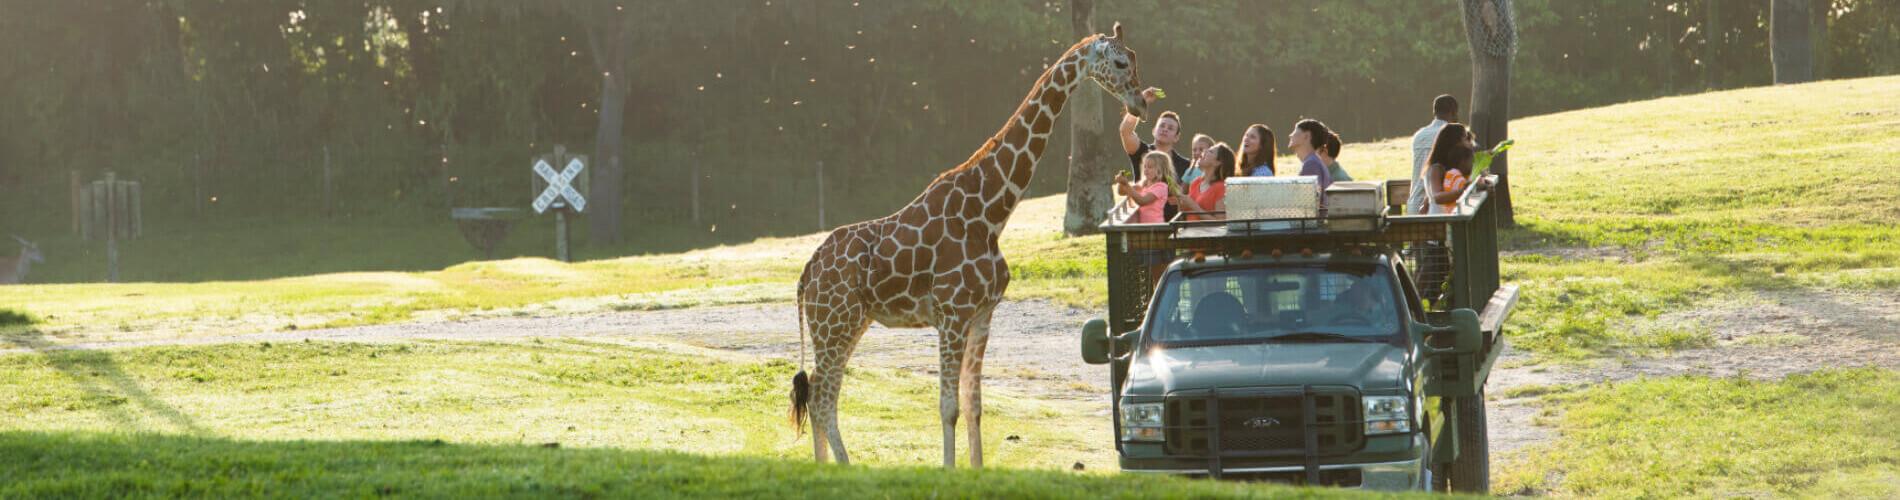 Take a Tour at Busch  Gardens Tampa Bay